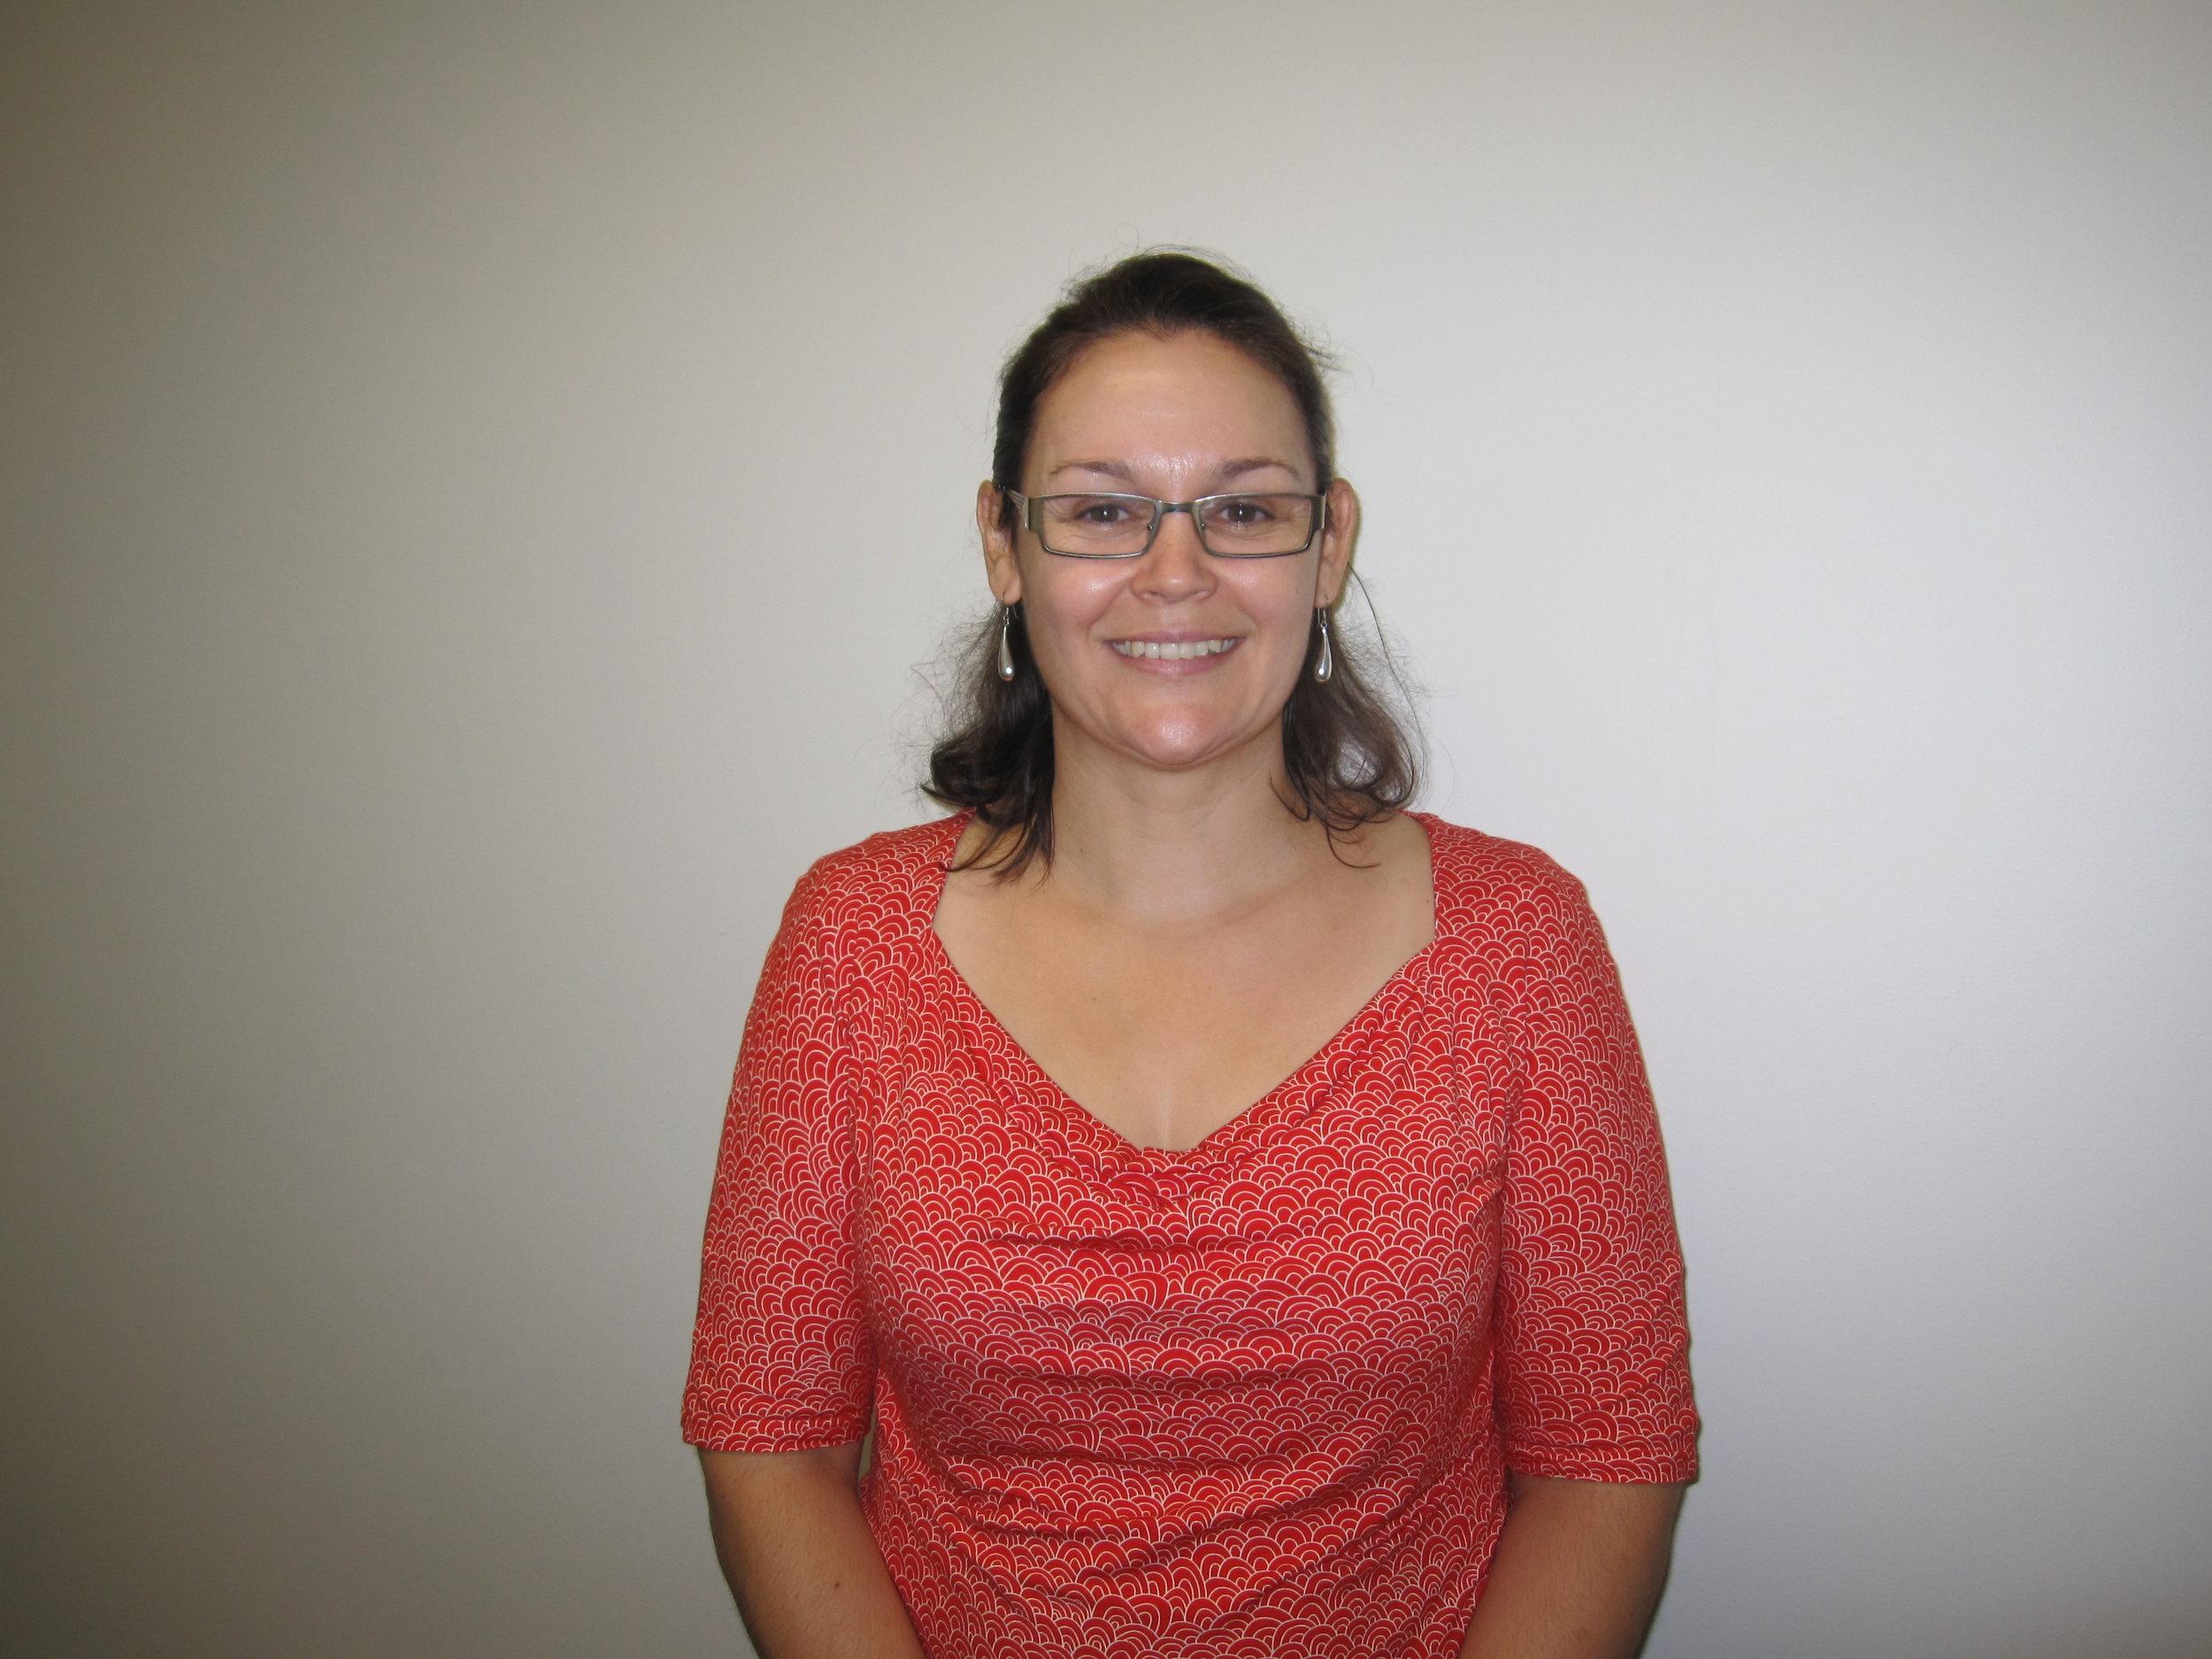 Dr amanda mergler - Senior lecturer at Queensland University of Technology. Trained psychologist and doting Mother.